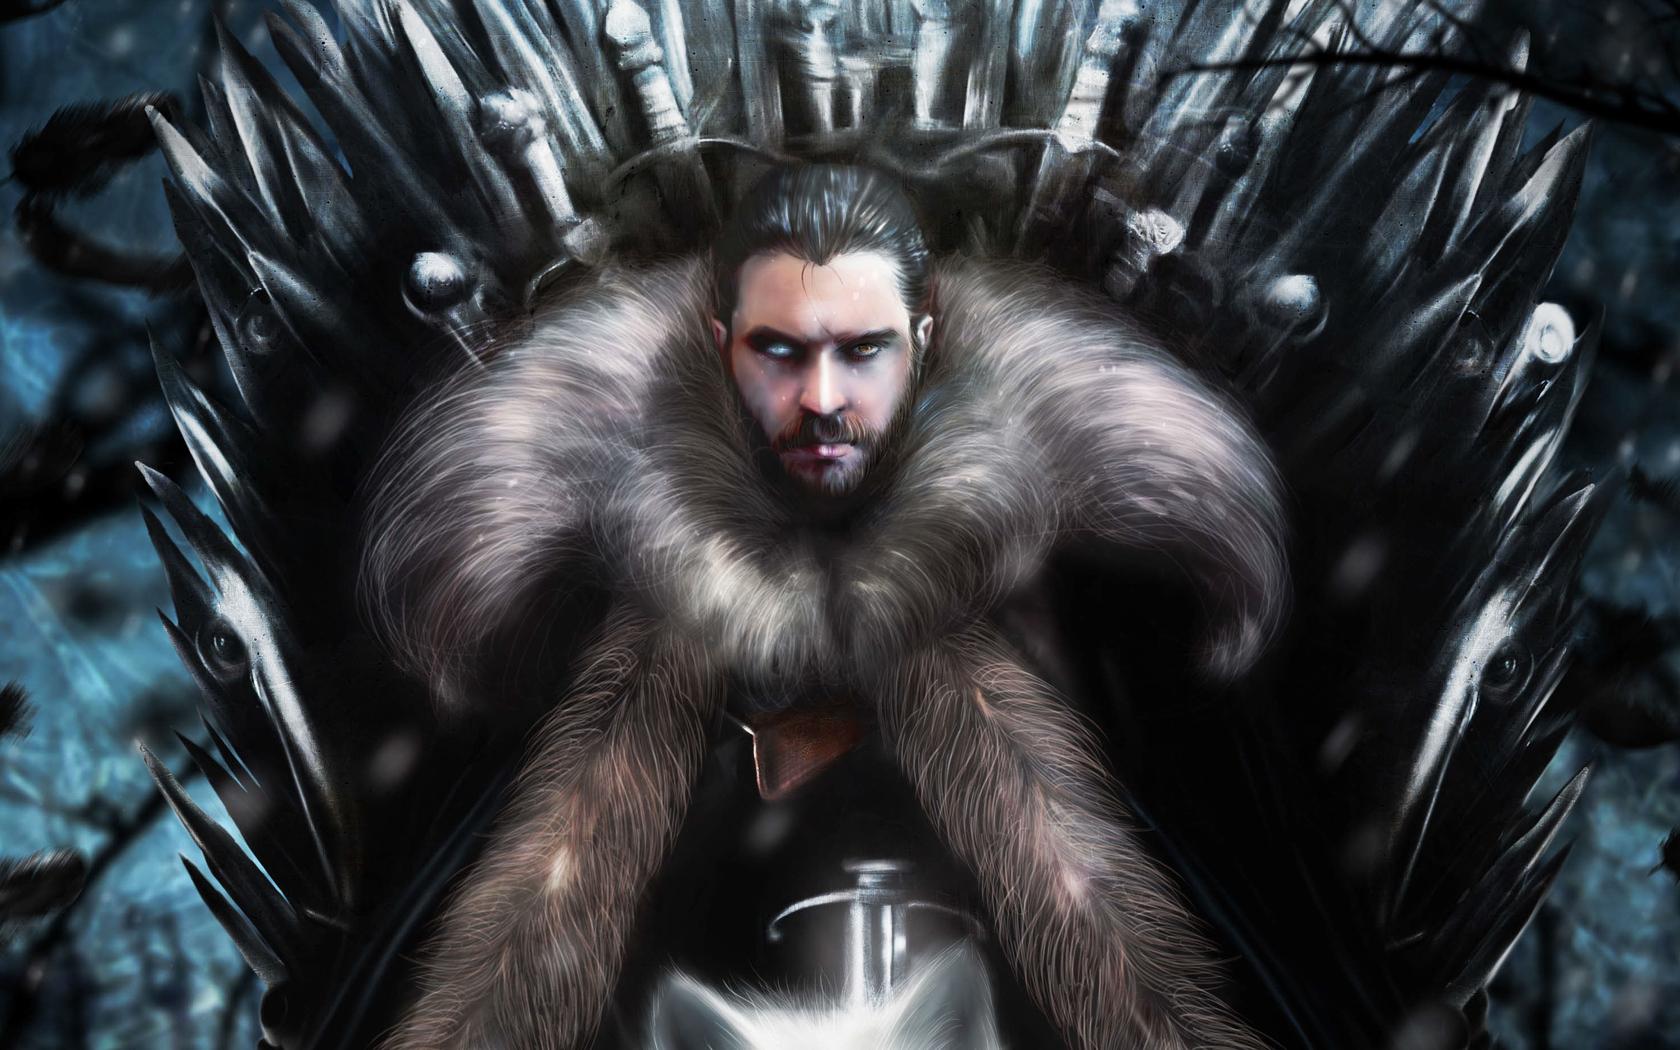 game of thrones season 8 hd download